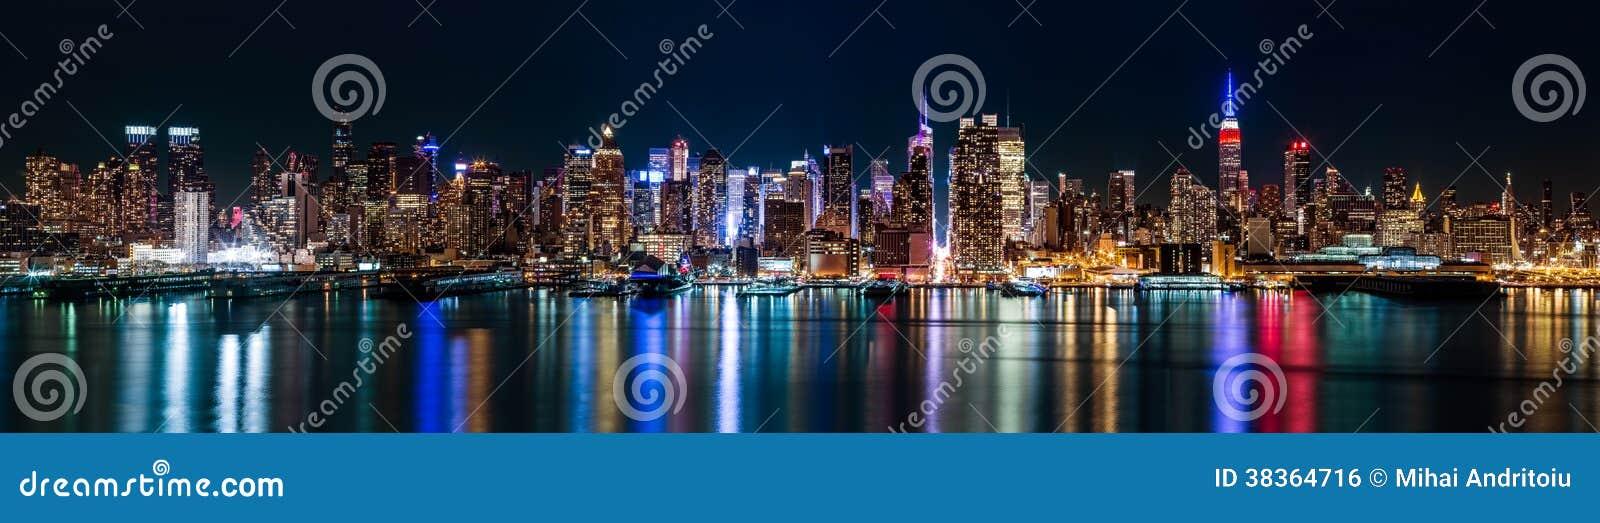 Panorama di midtown di new york di notte immagine stock for Foto new york notte